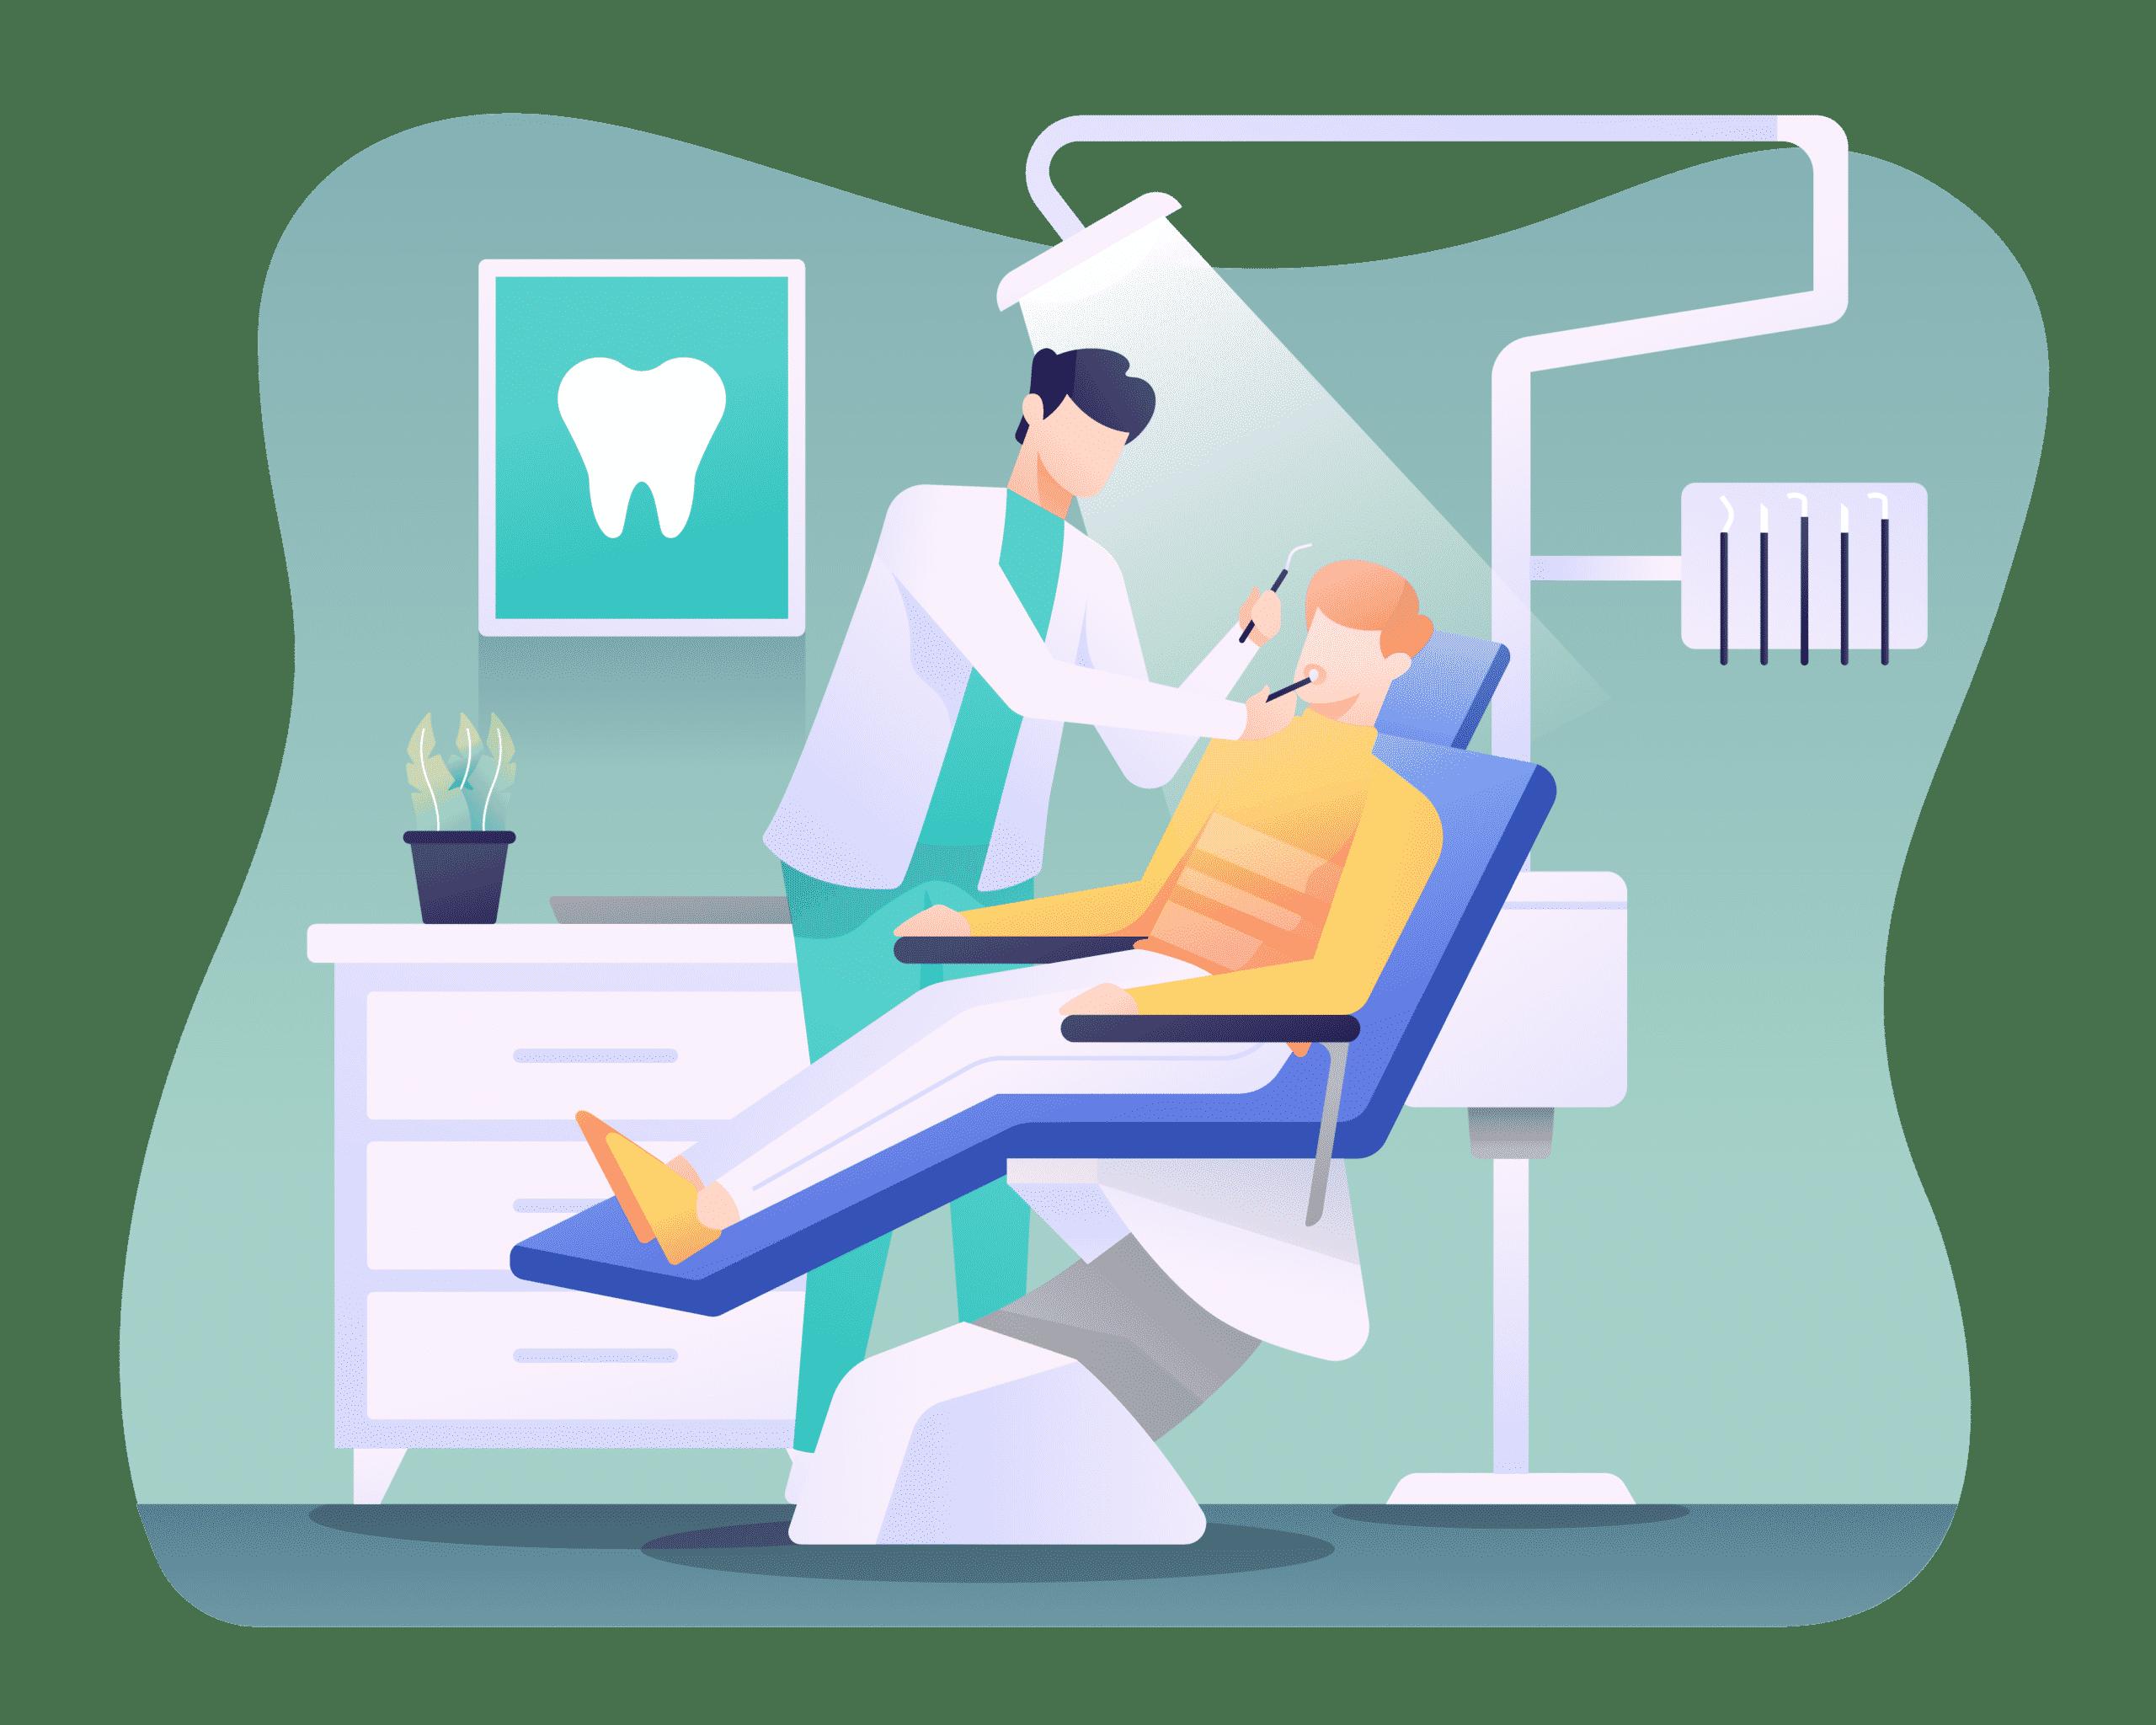 Dr. Kari, VIP Family & Sedation Dentistry